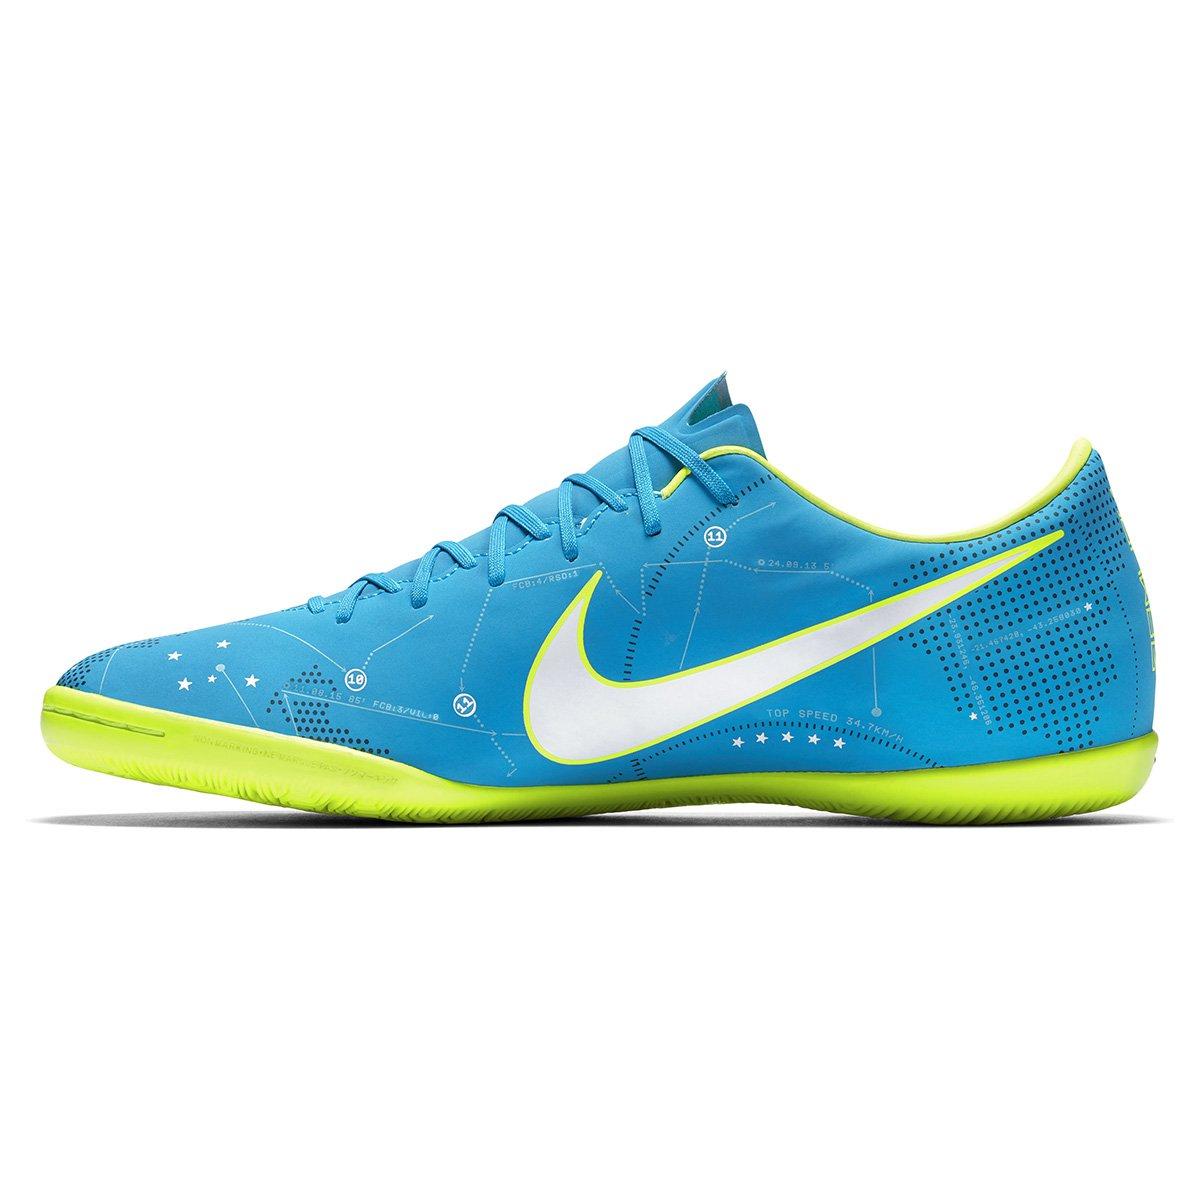 Chuteira Futsal Nike Mercurial Victory 6 Neymar Jr IC - Compre Agora ... 9200b75ee3771